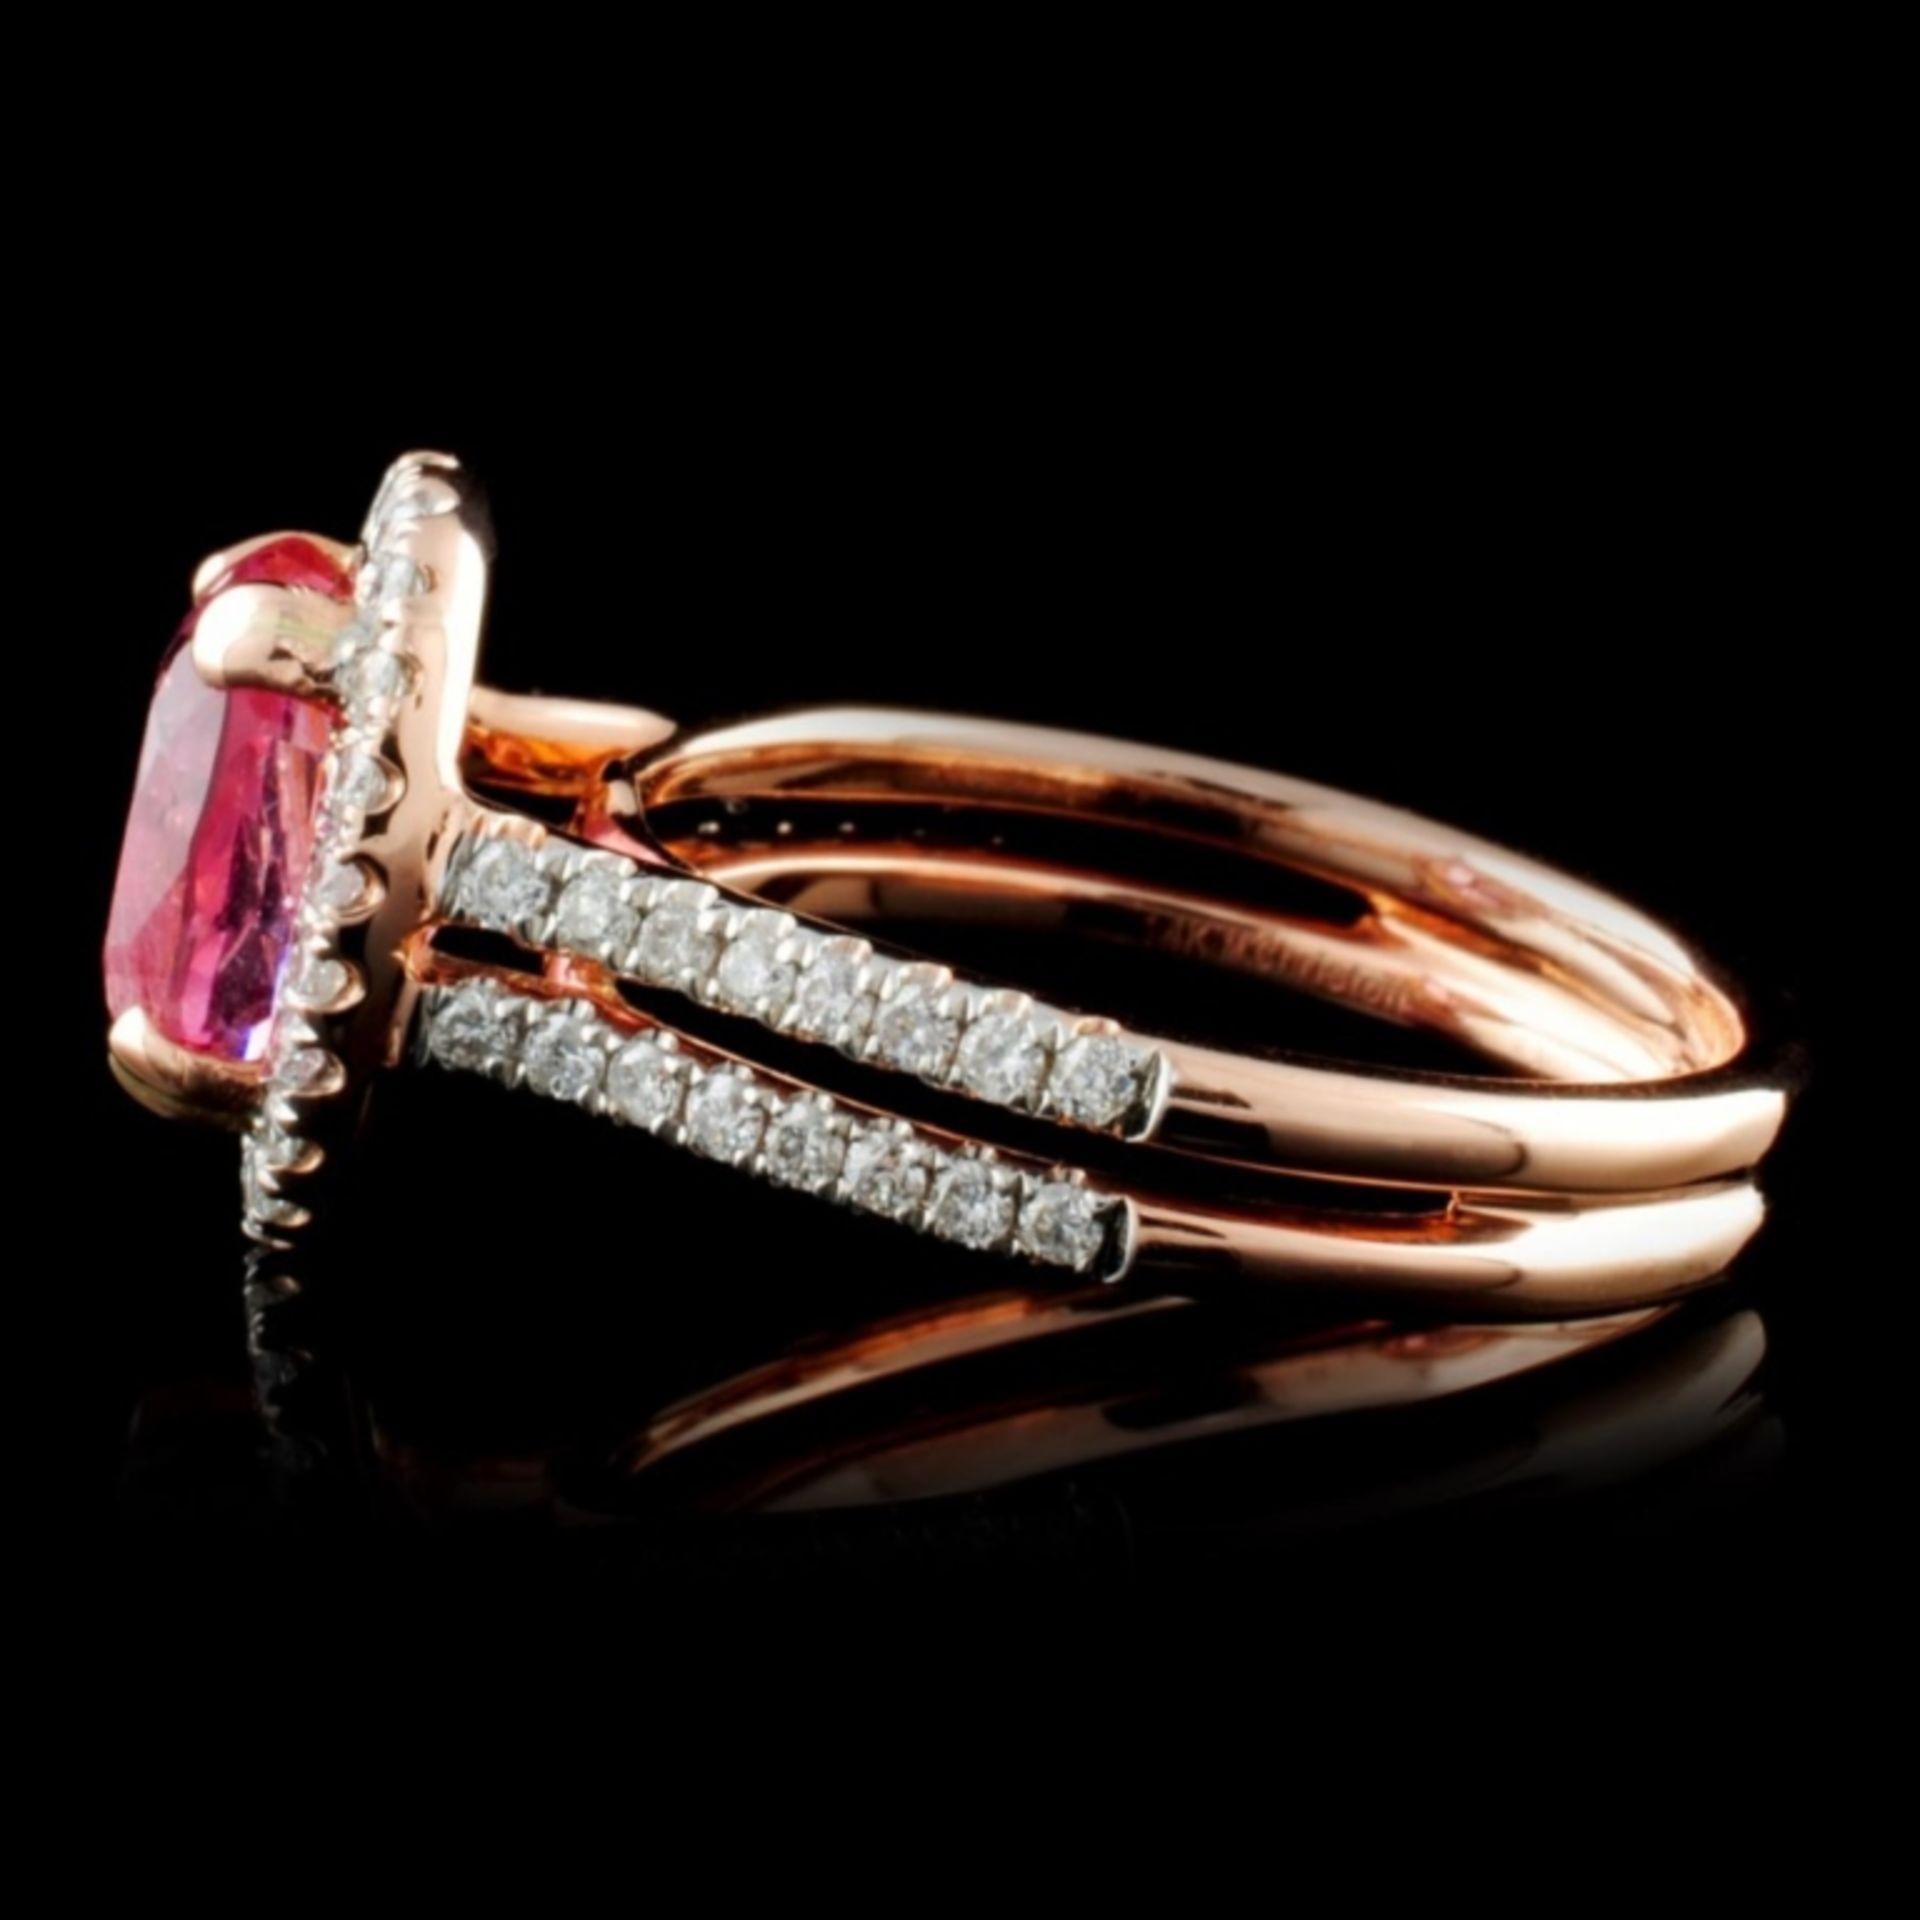 14K Rose Gold 2.40ct Spinel & 0.46ctw Diamond Ring - Image 3 of 4